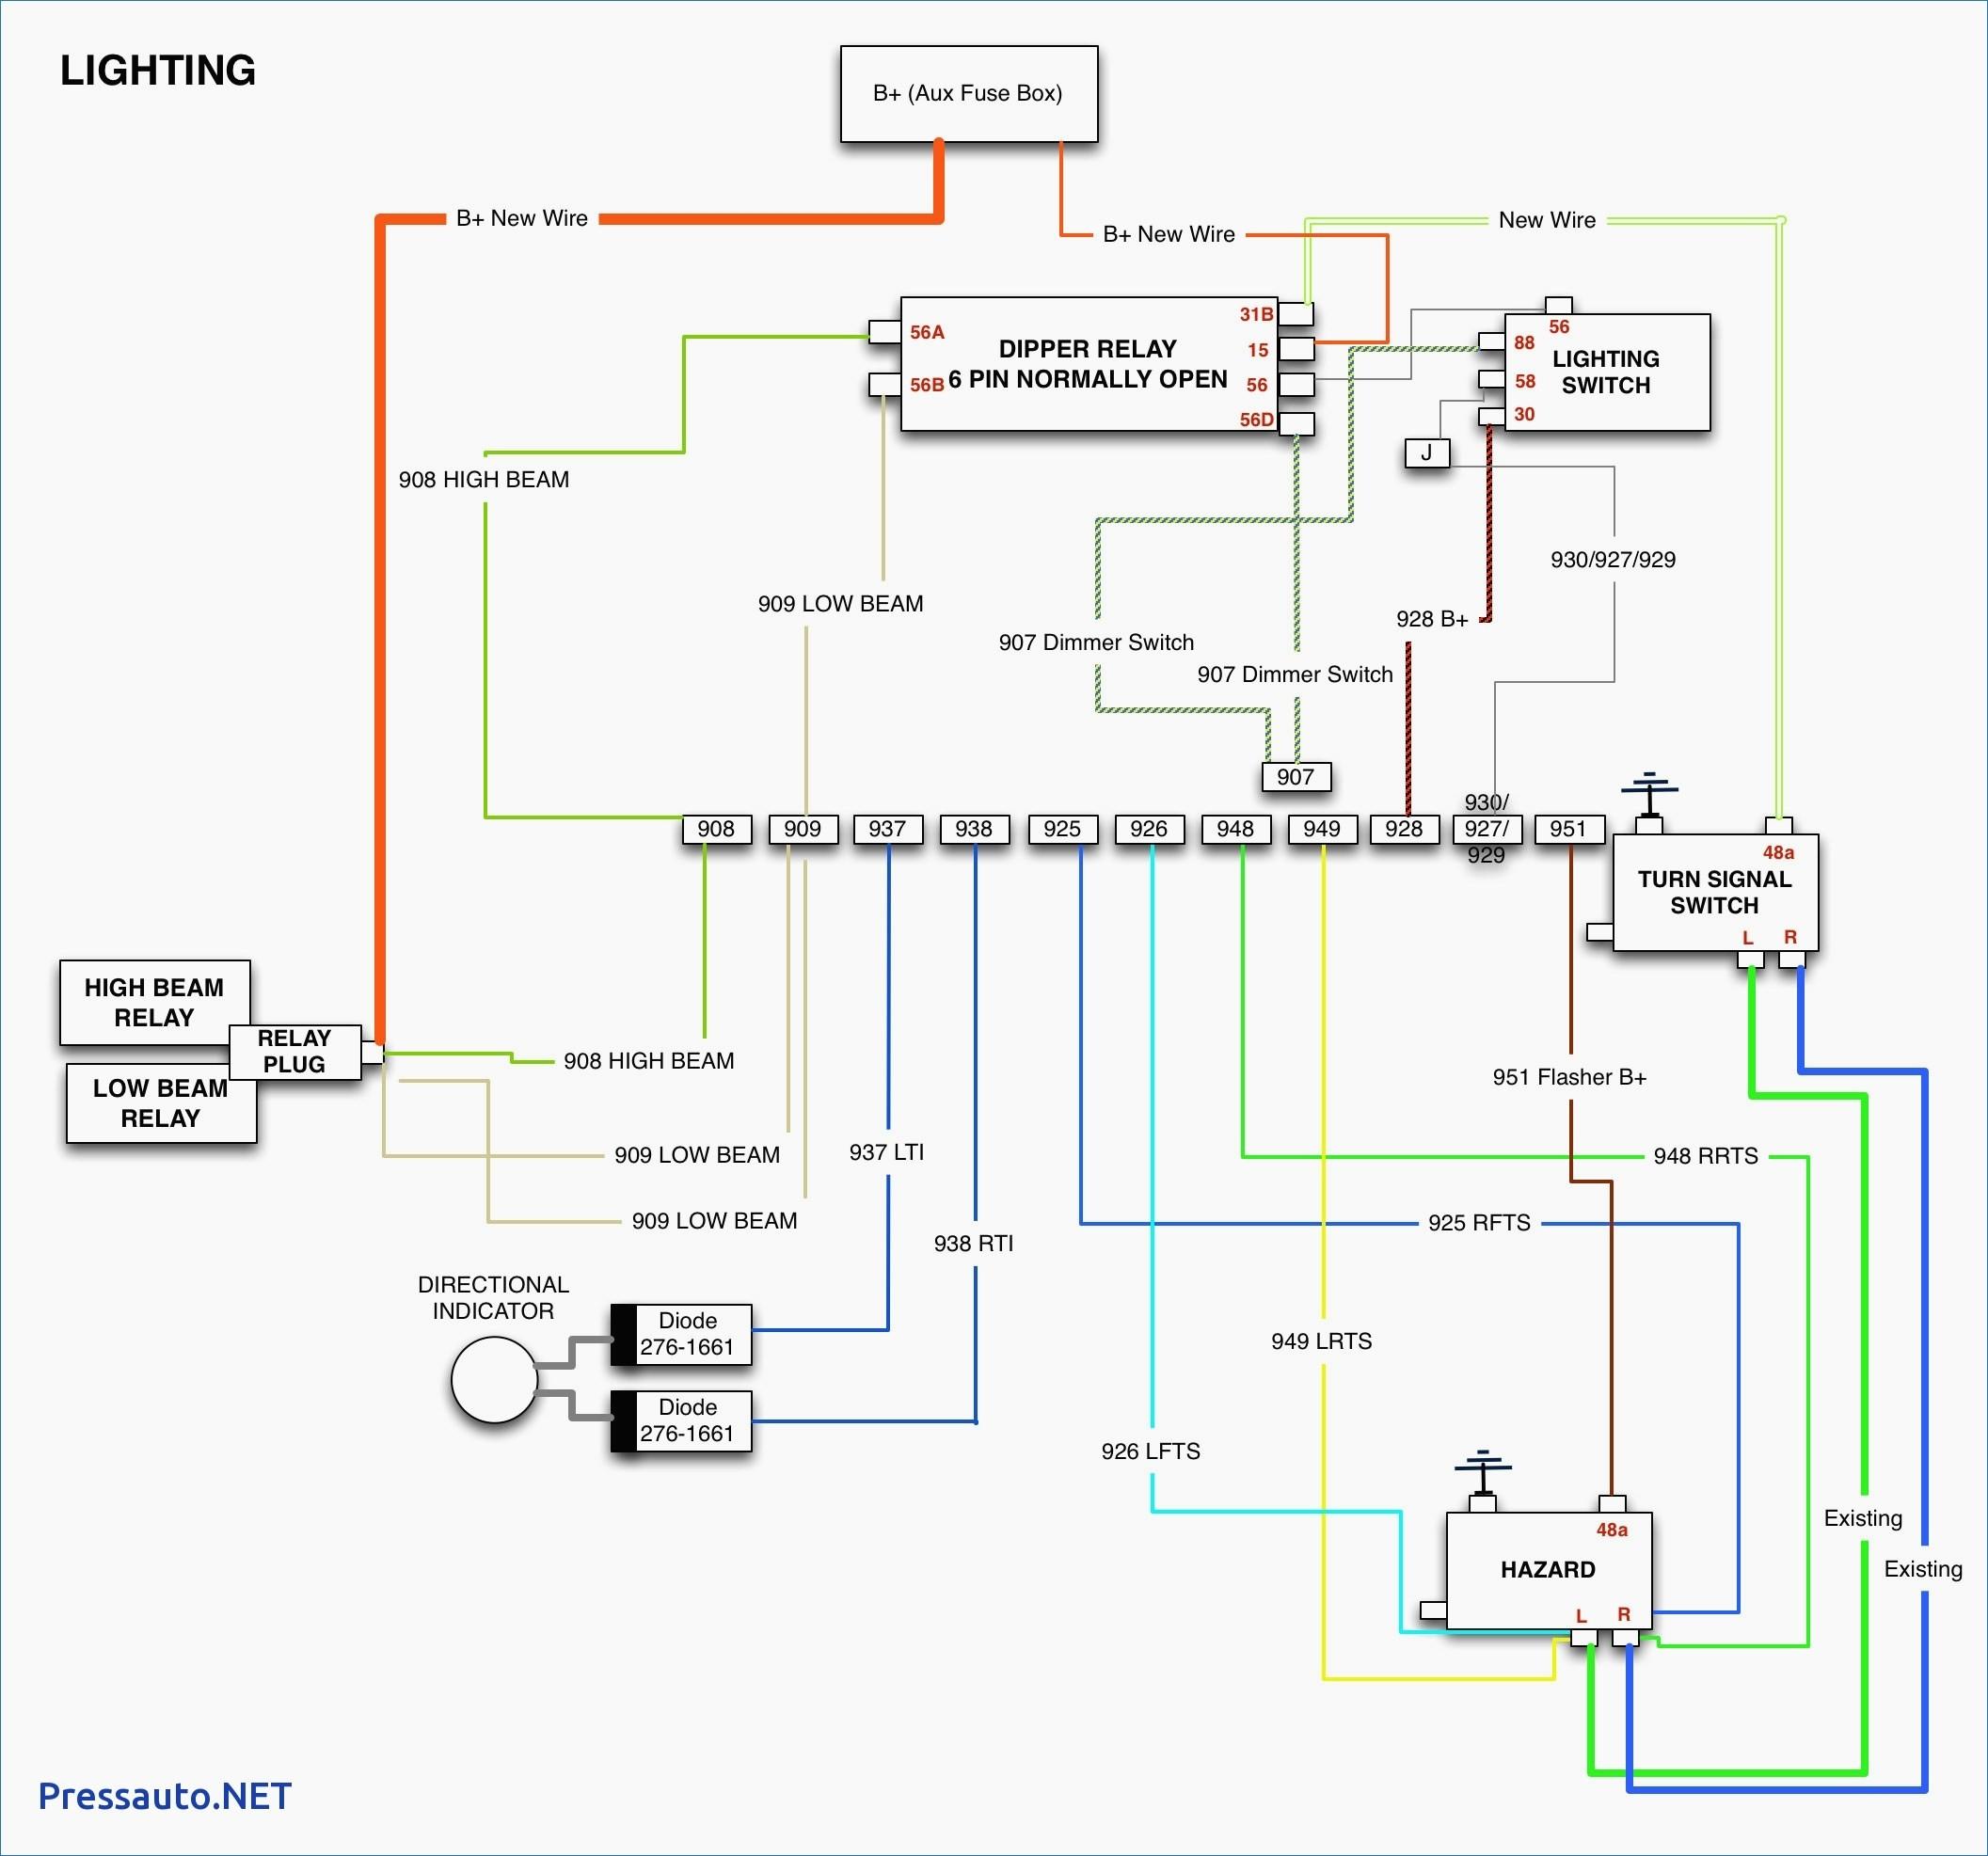 ribu1s wiring diagram Download-Wiring Diagram for Standard Relay Best Ribu1c Wiring Diagram 5-k